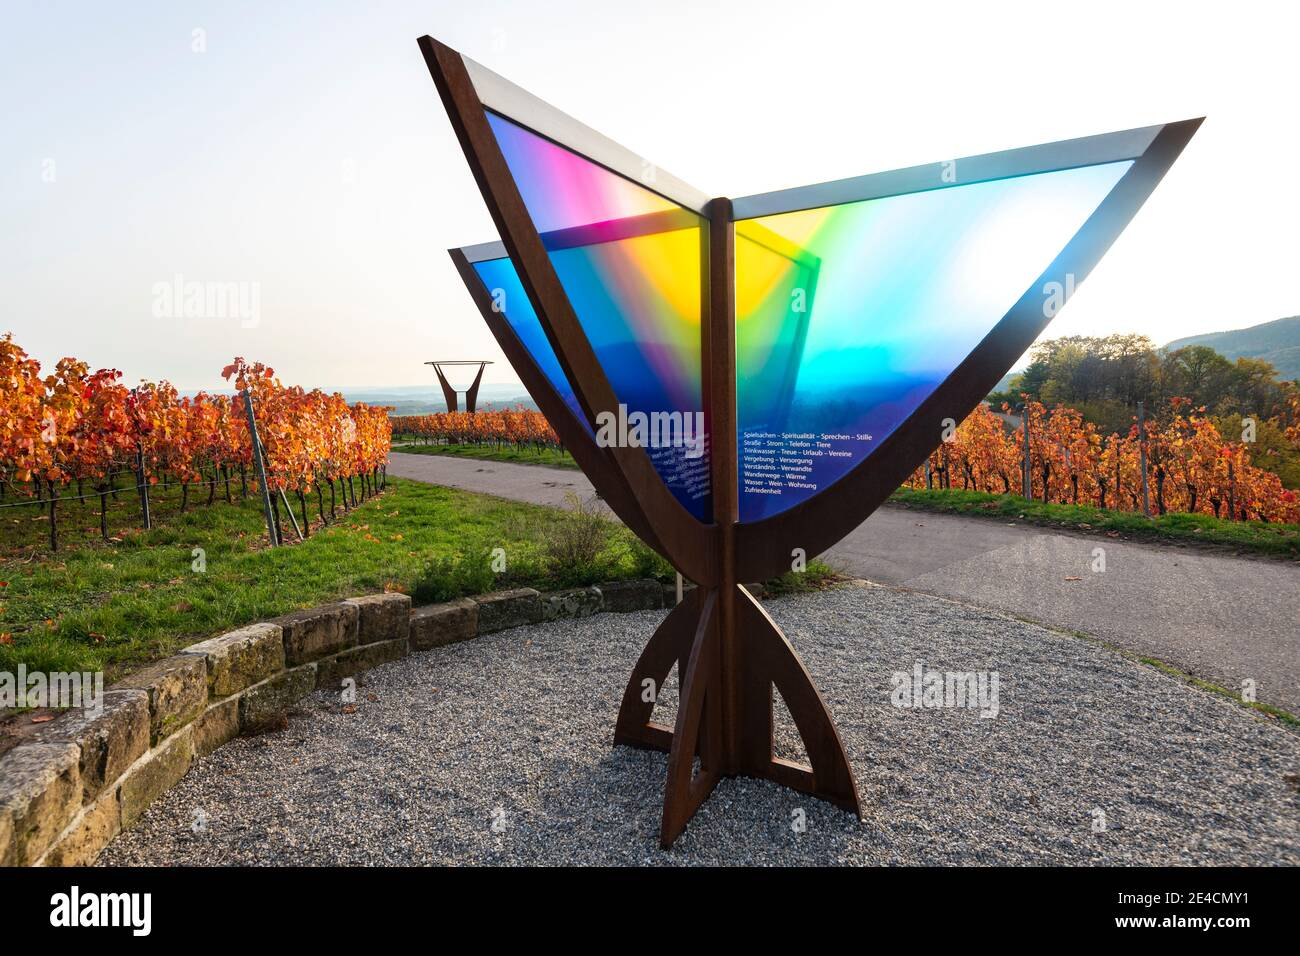 Europe, Germany, Baden-Wuerttemberg, Stromberg Heuchelberg Nature Park, Hohenhaslach, vineyard, autumn colors, far-sighted path, chalice of gratitude and joy Stock Photo